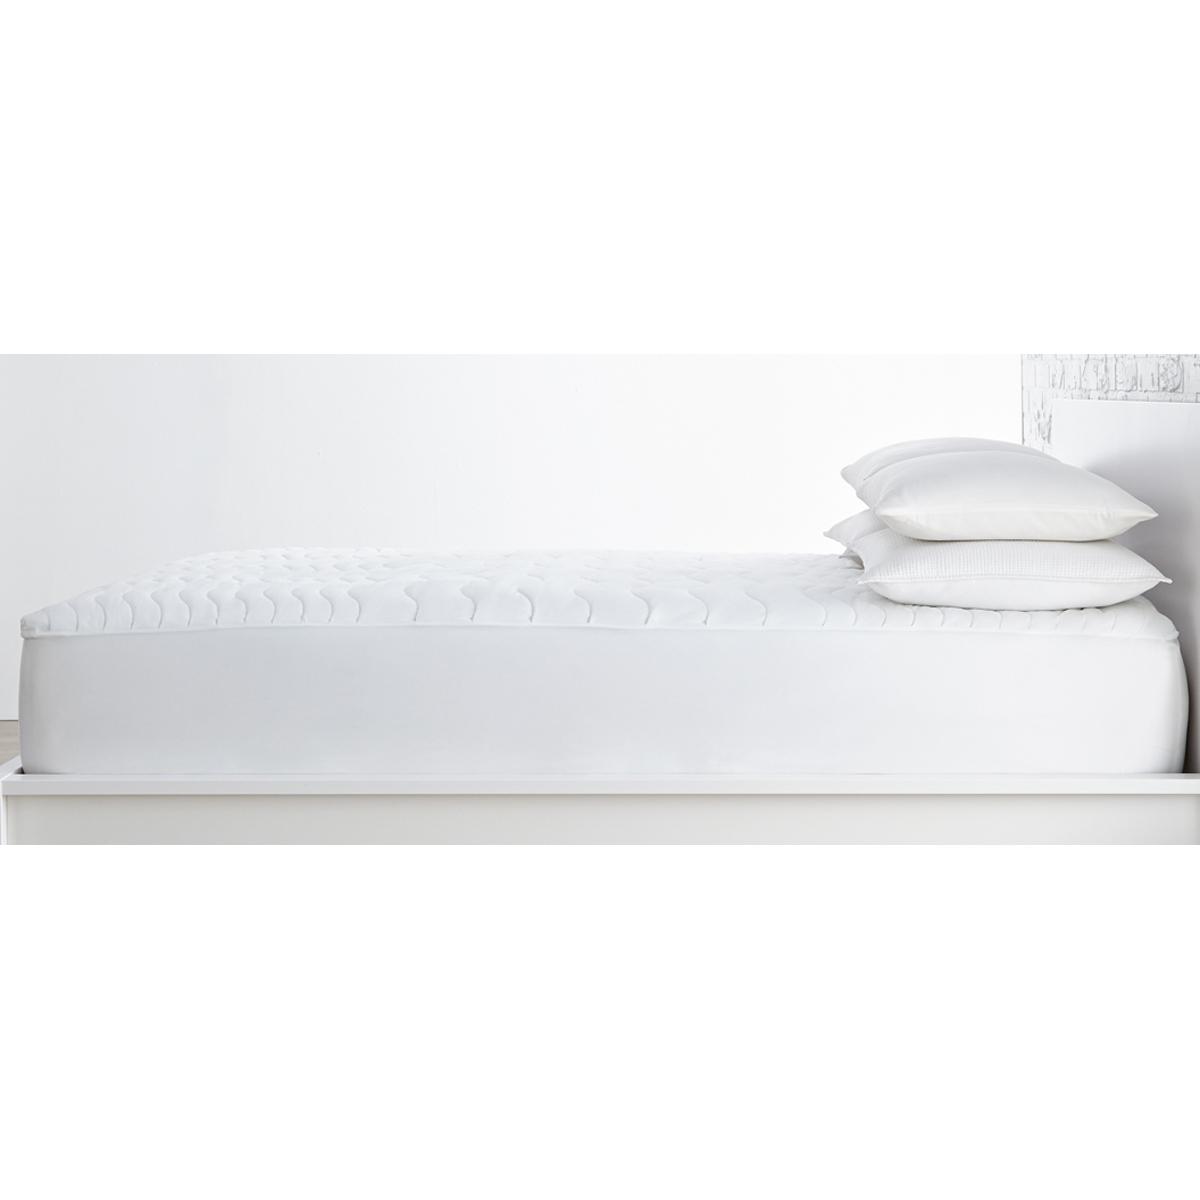 Sunbeam health™ RESTORE™ Heated Mattress Pad, Twin Size